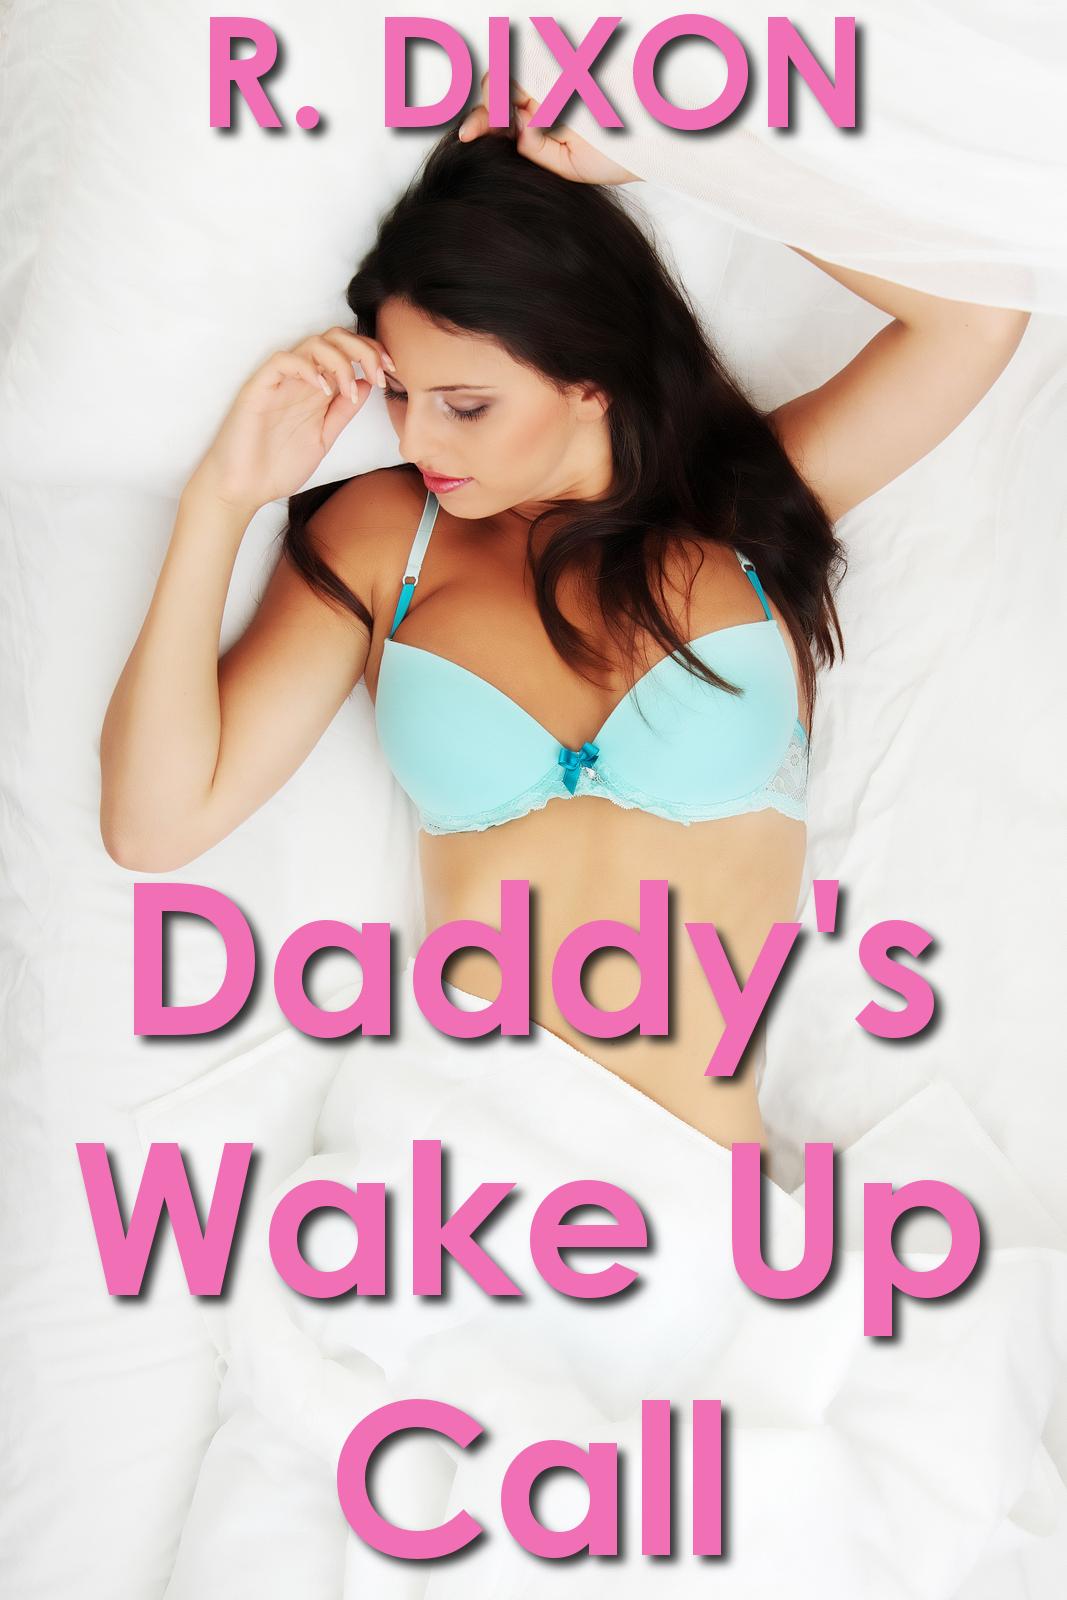 Dad daughter sleep sex stories